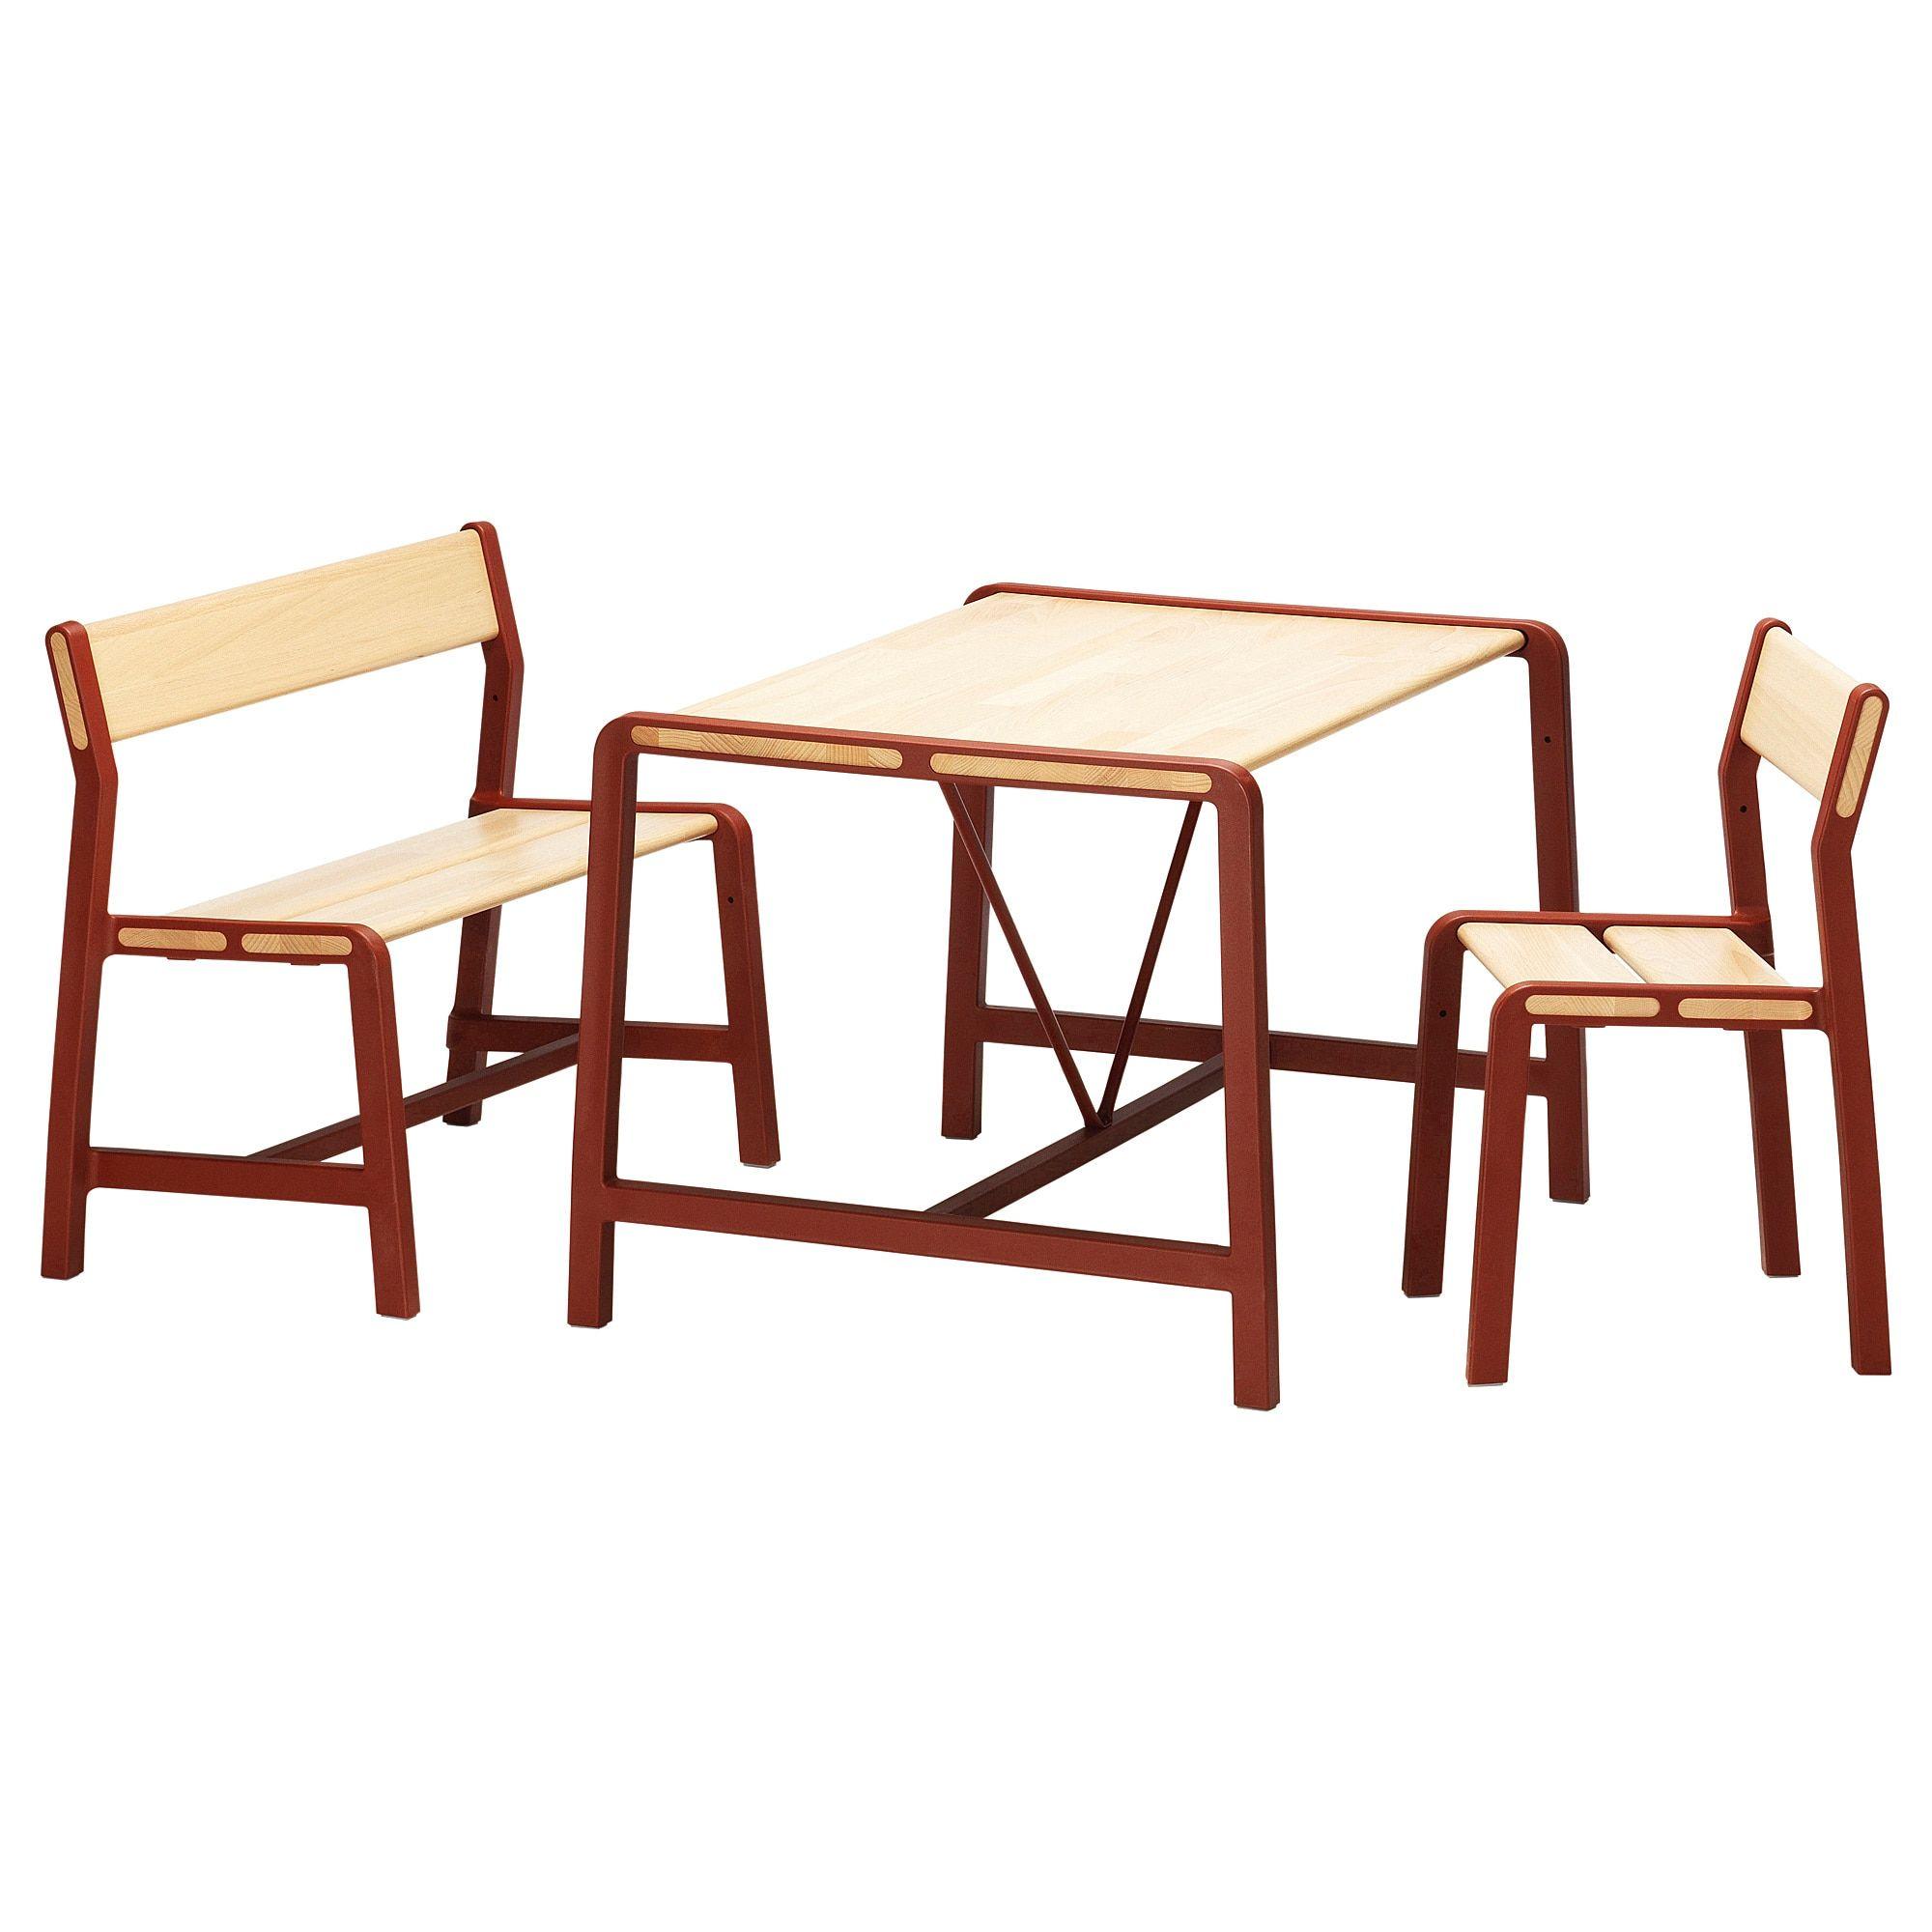 Ypperlig Kindertisch Mit Bank Und Stuhl Ikea Deutschland Kindertafel Kindermeubelen Stoel Ikea